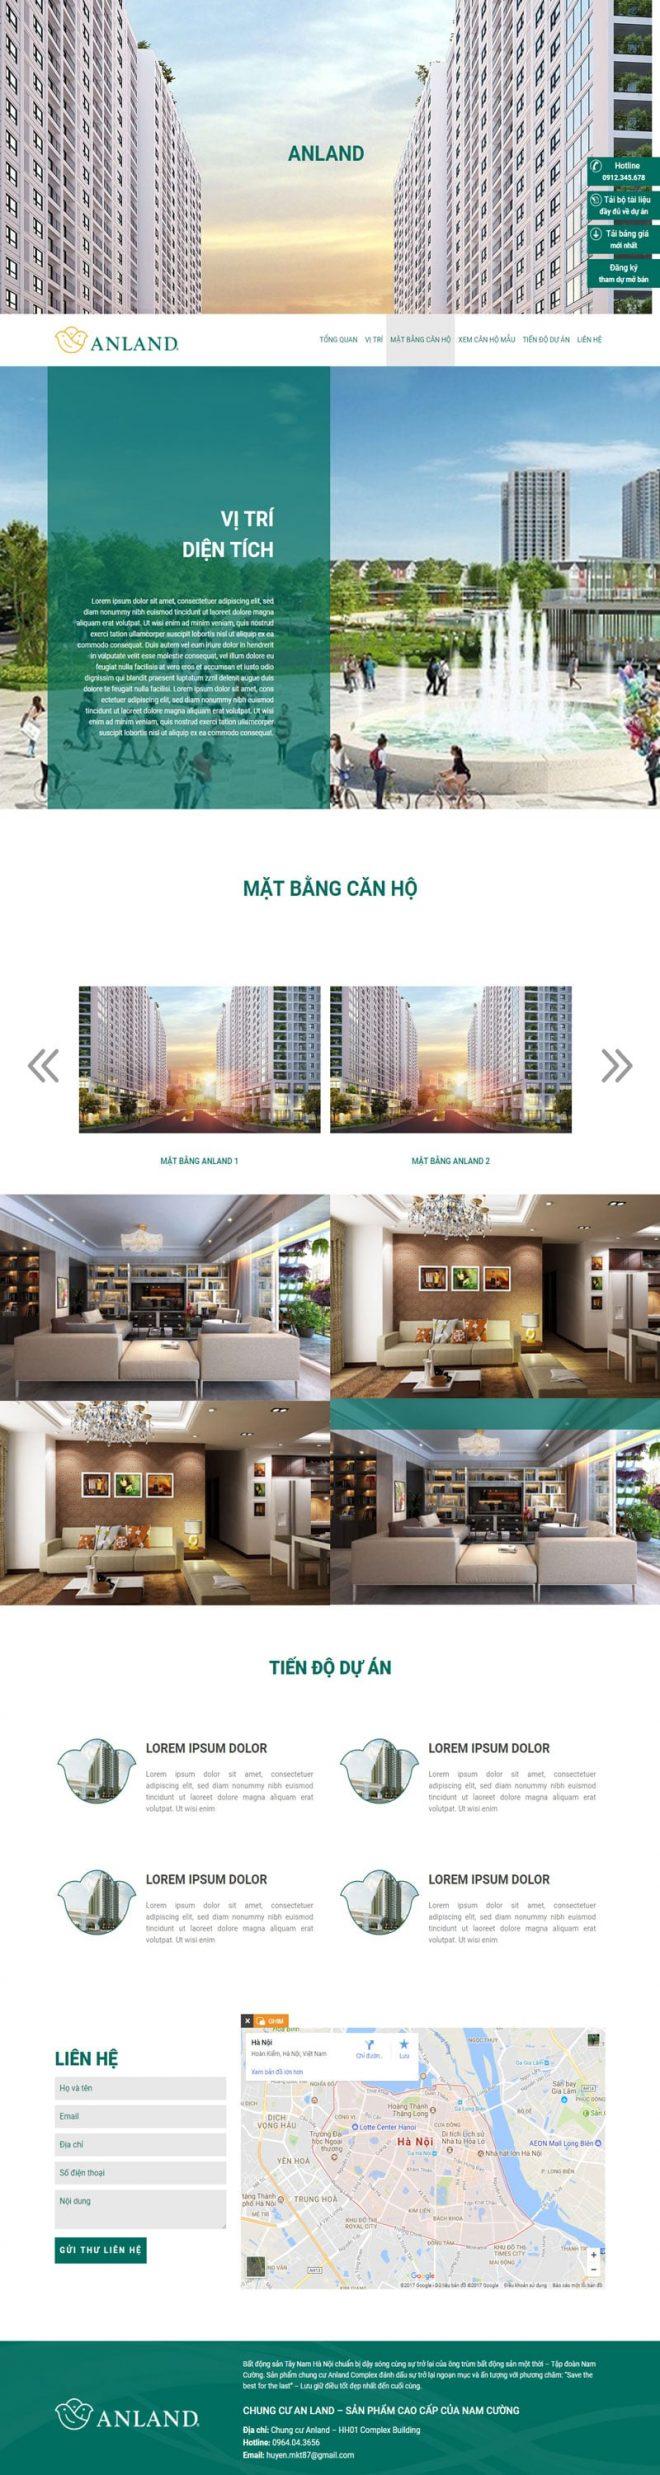 screencapture-batdongsan-mediaworks-vn-du-an-anland-1500519288348